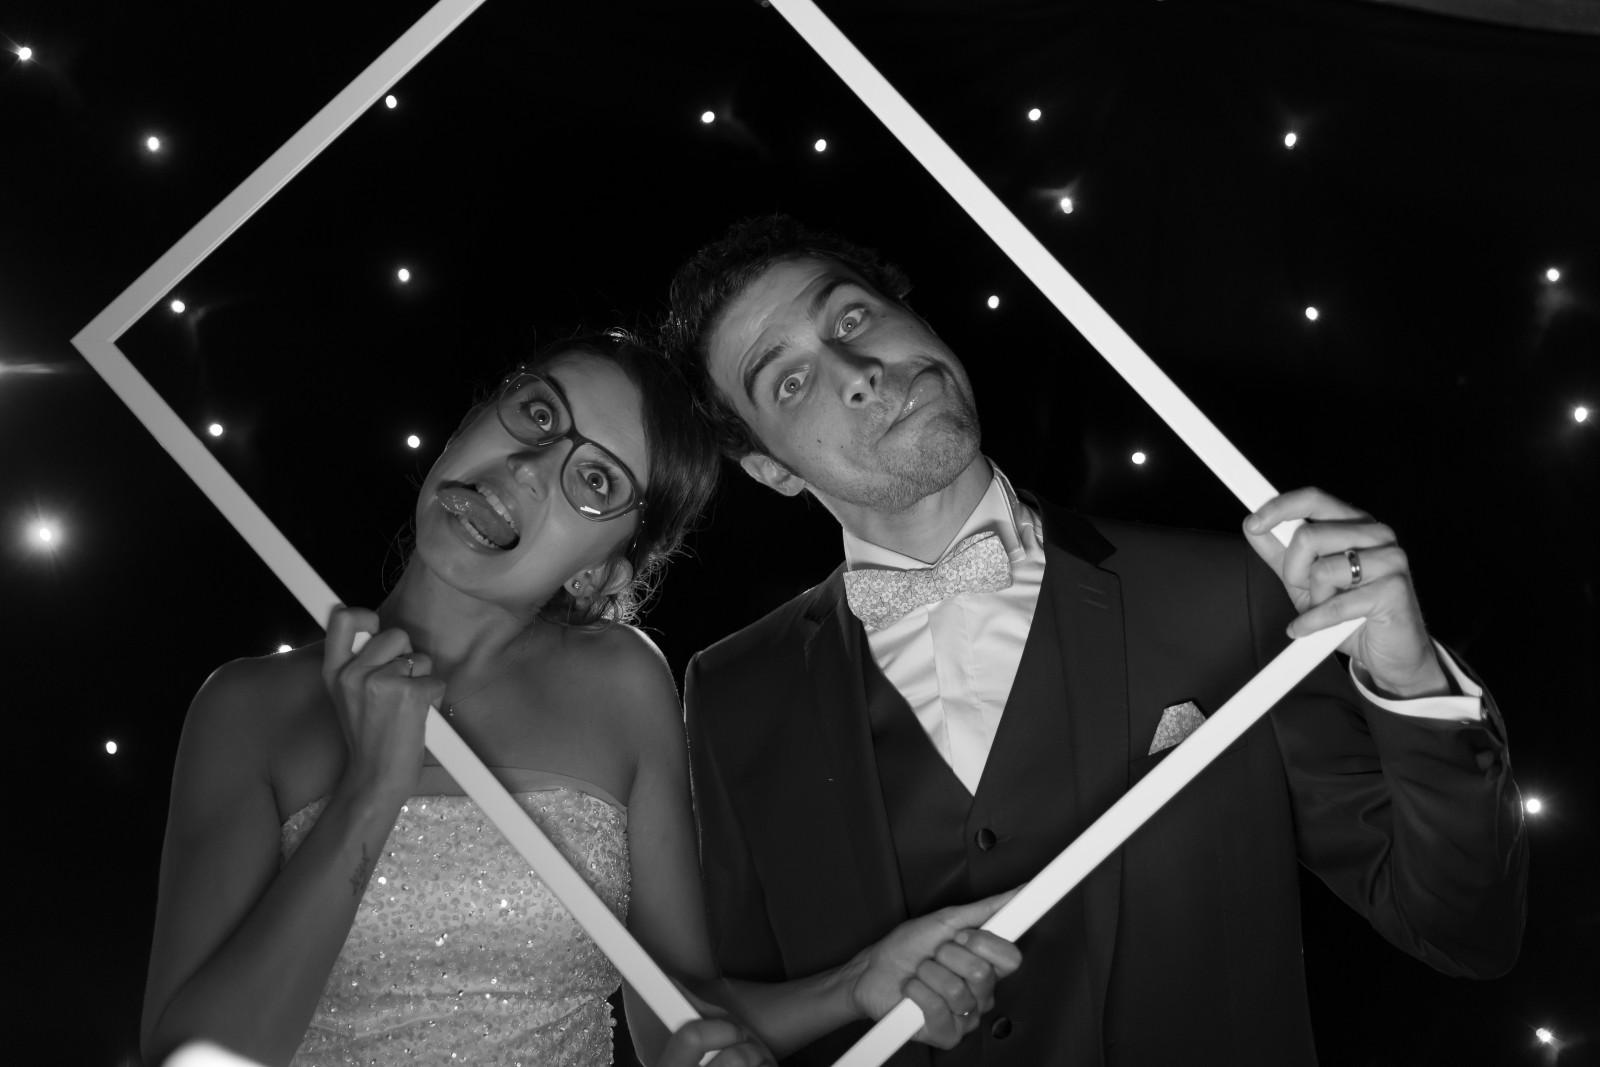 wedding planner lyon - enjoy evenements